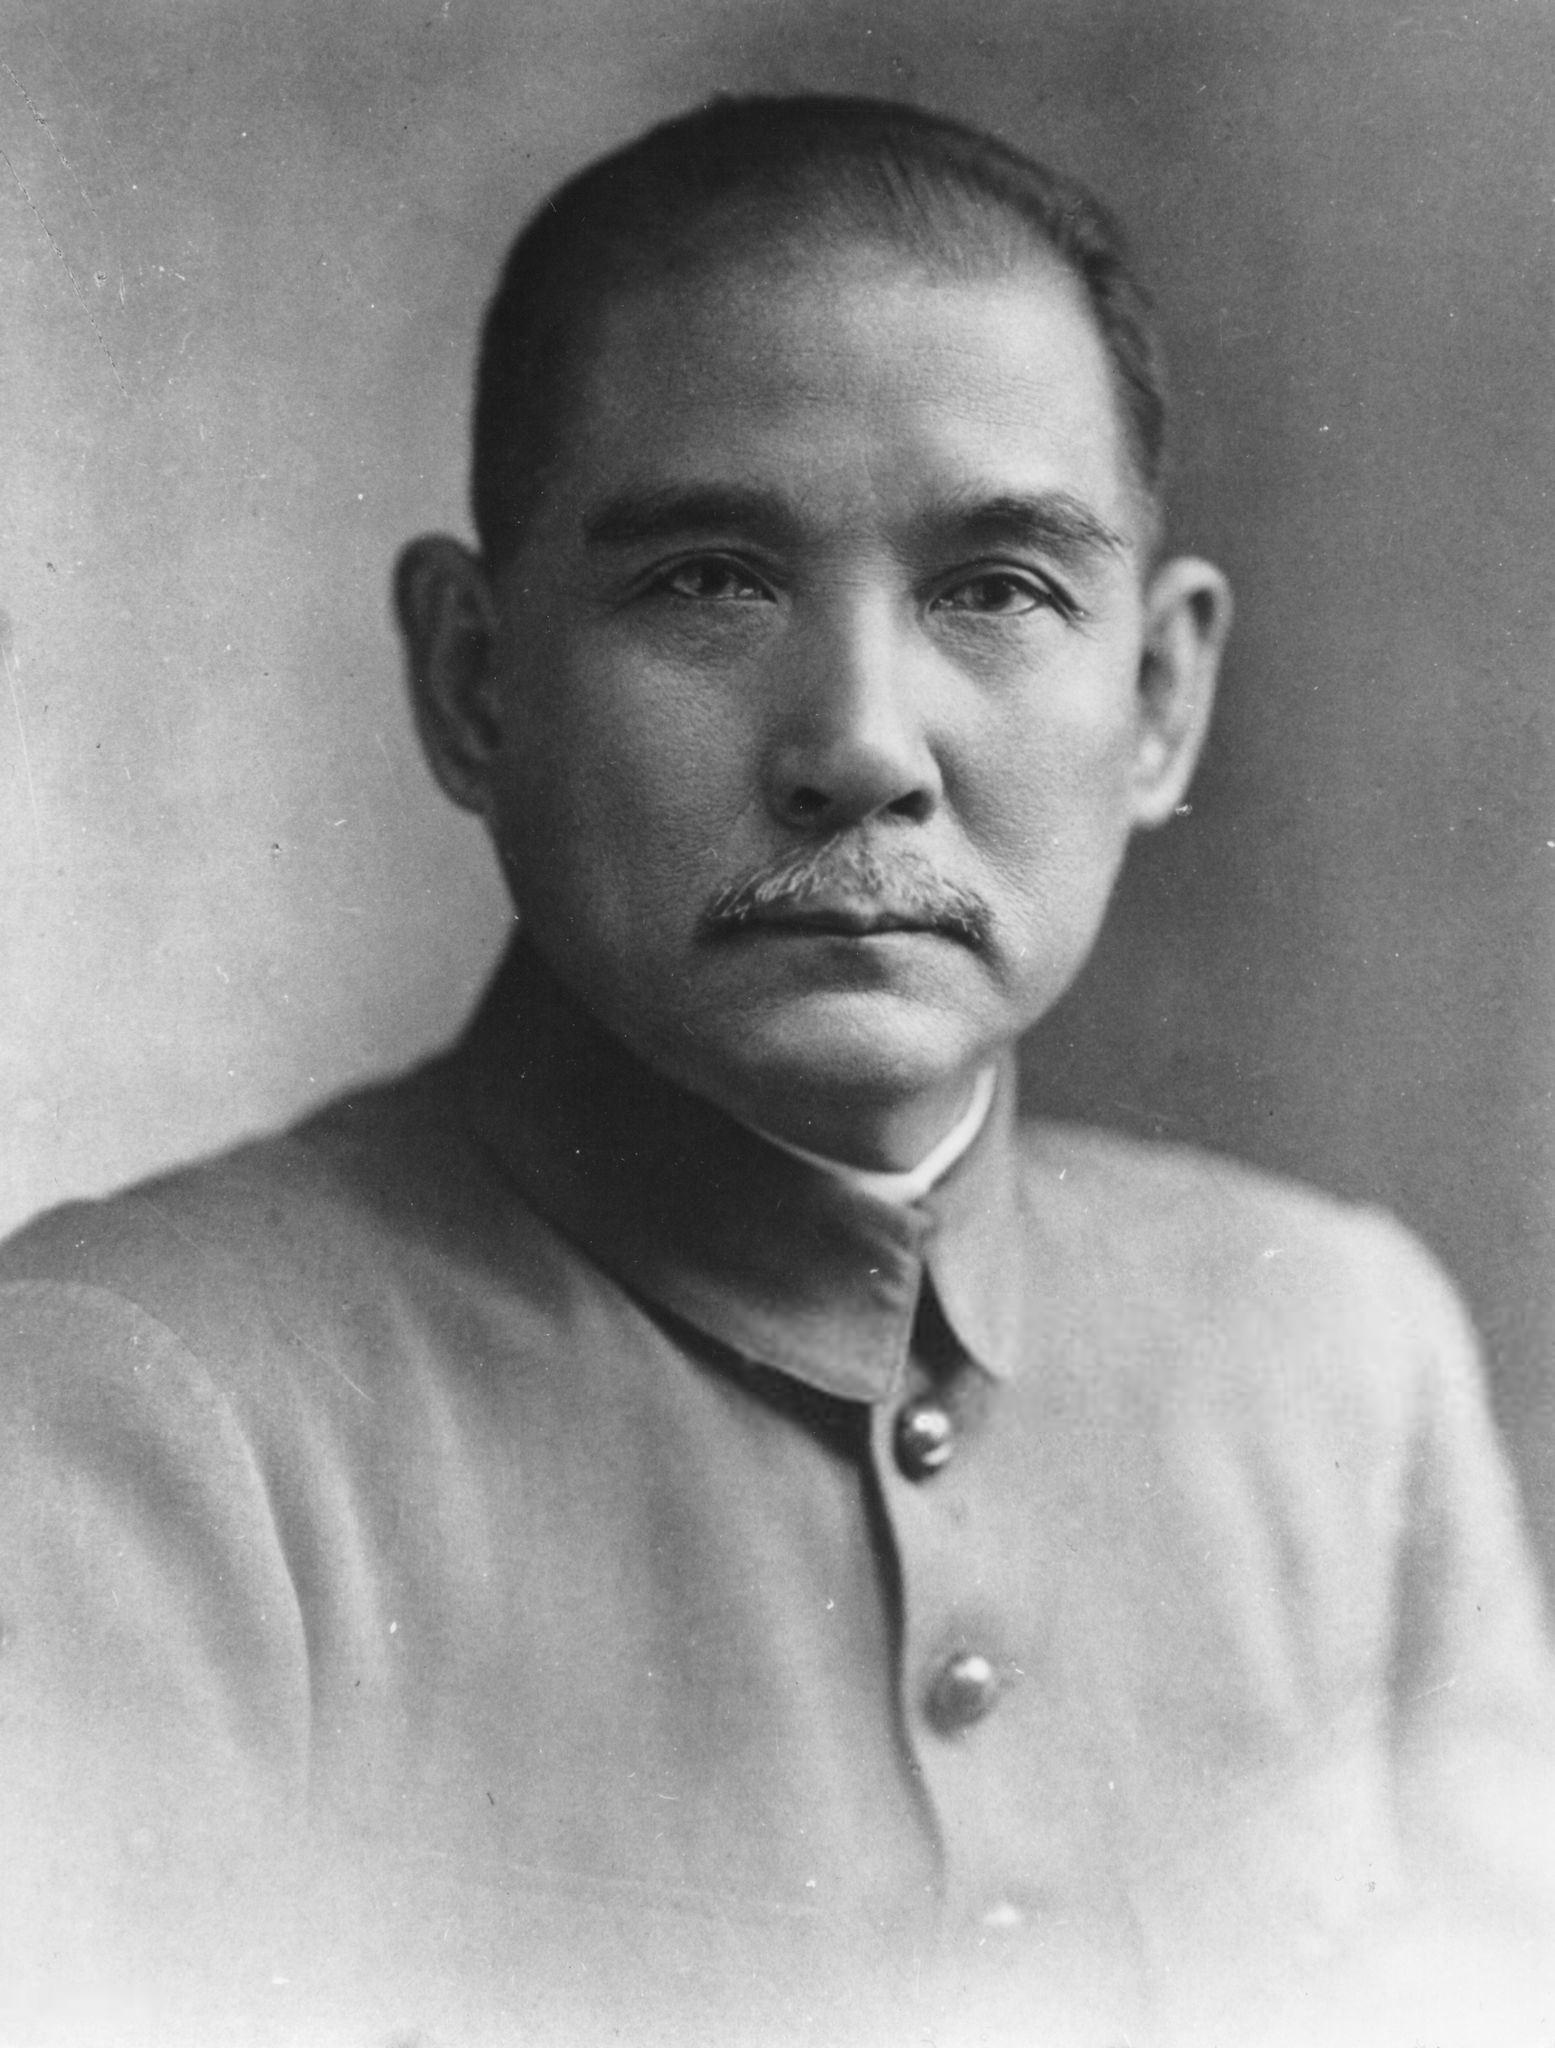 Portrait of Sun Yat-Sen in the 1910s